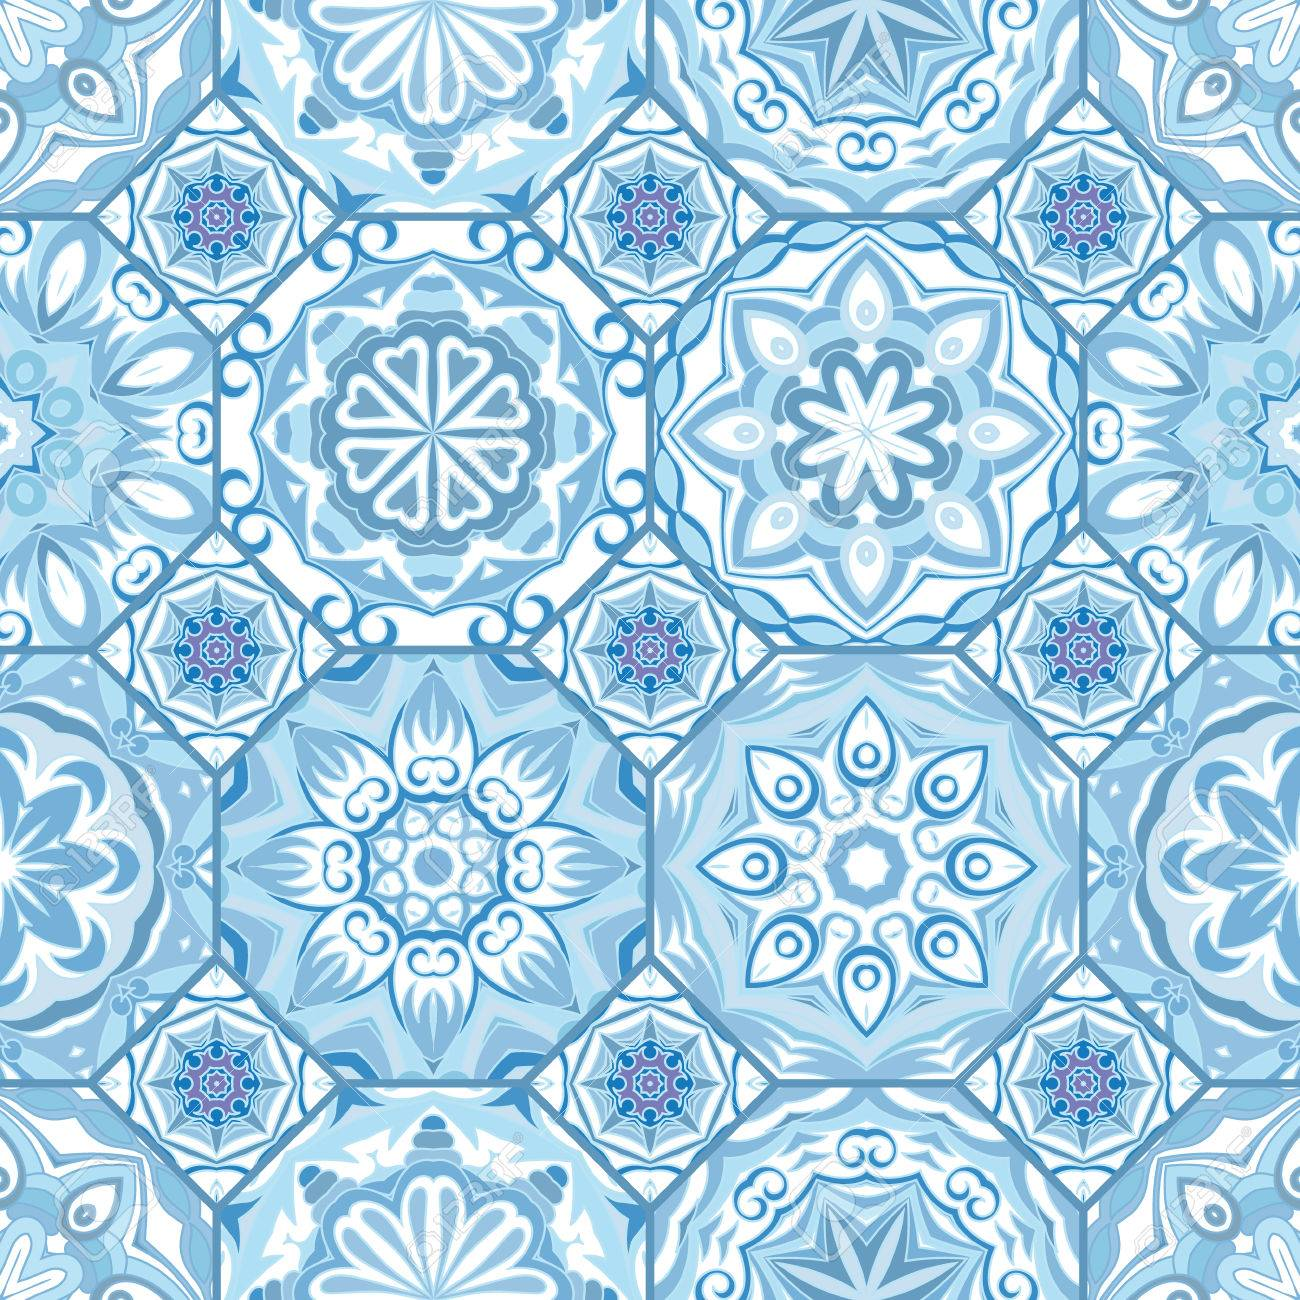 Gorgeous Floral Tile Design. Moroccan Or Mediterranean Octagon ...